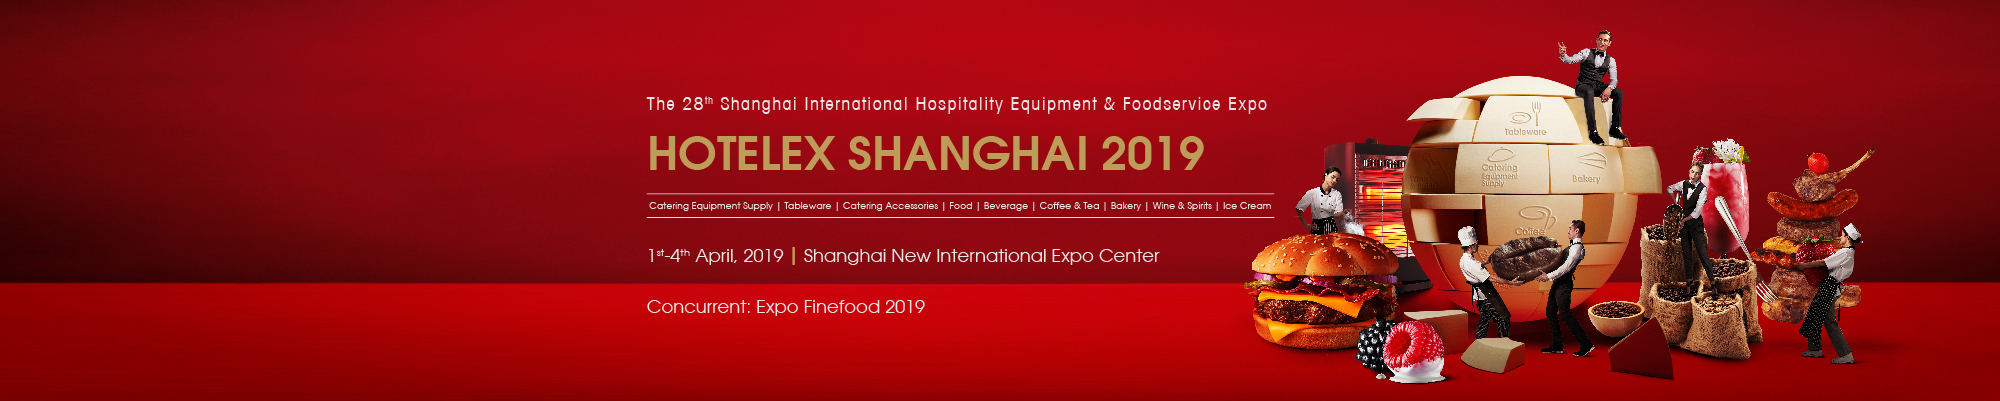 Hotelex Shanghai.jpeg